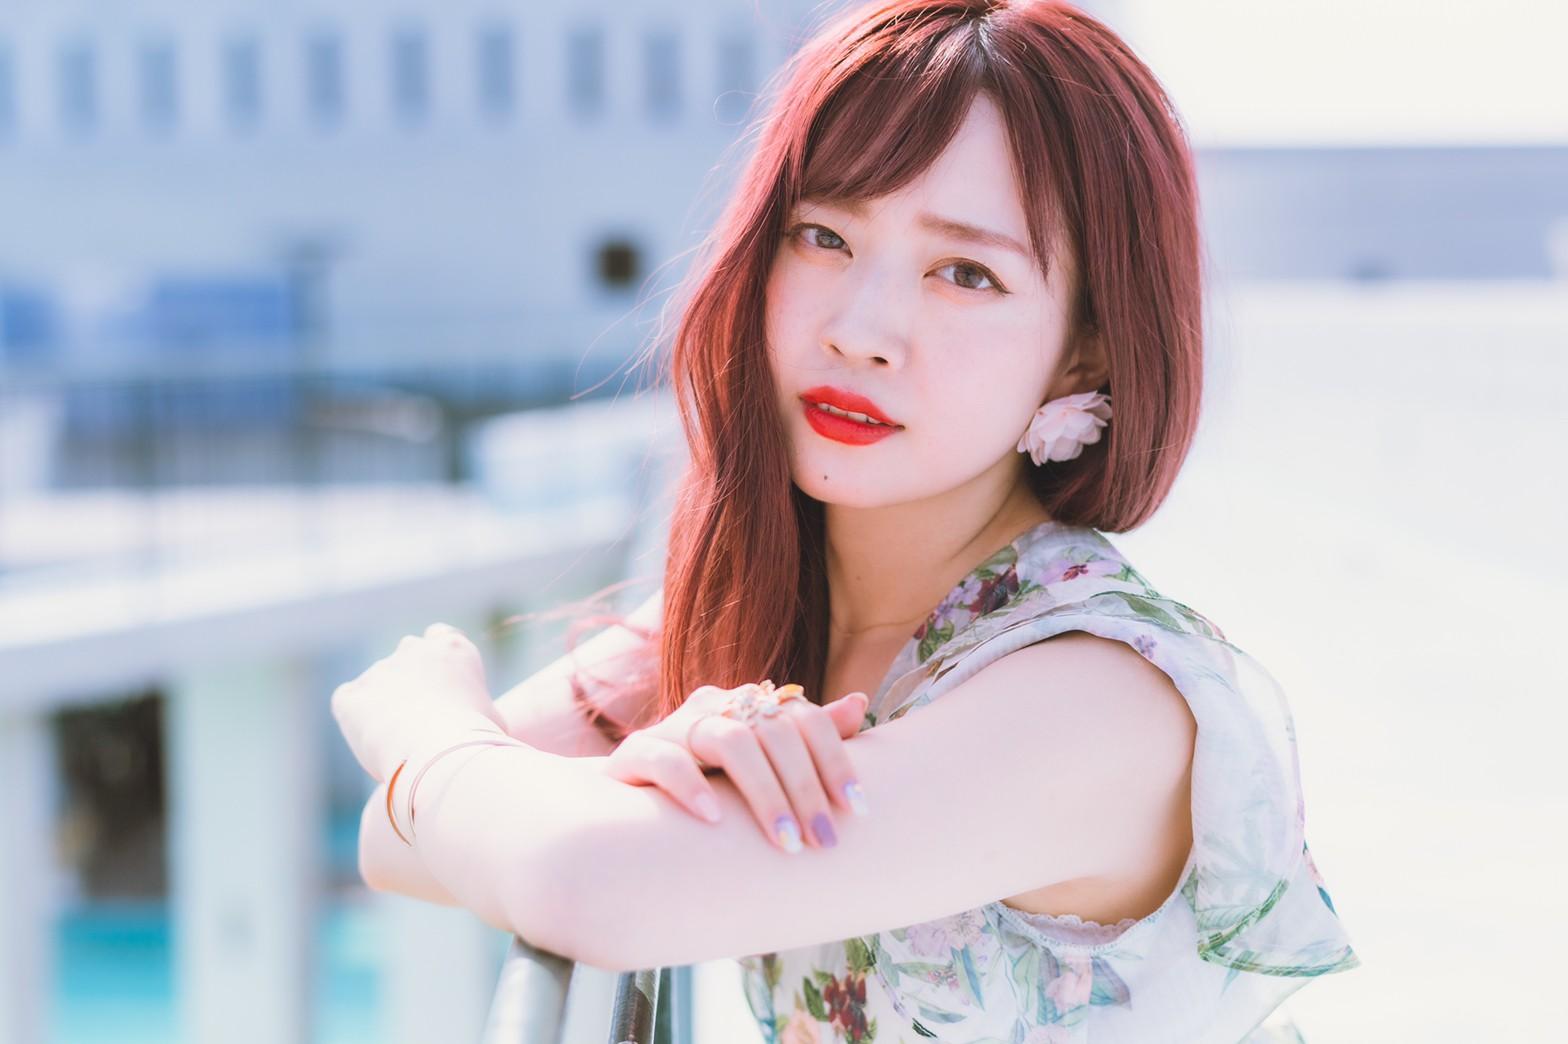 7月25日(日)ヨル撮 @泉中央駅周辺【⭐️満枠御礼⭐️】